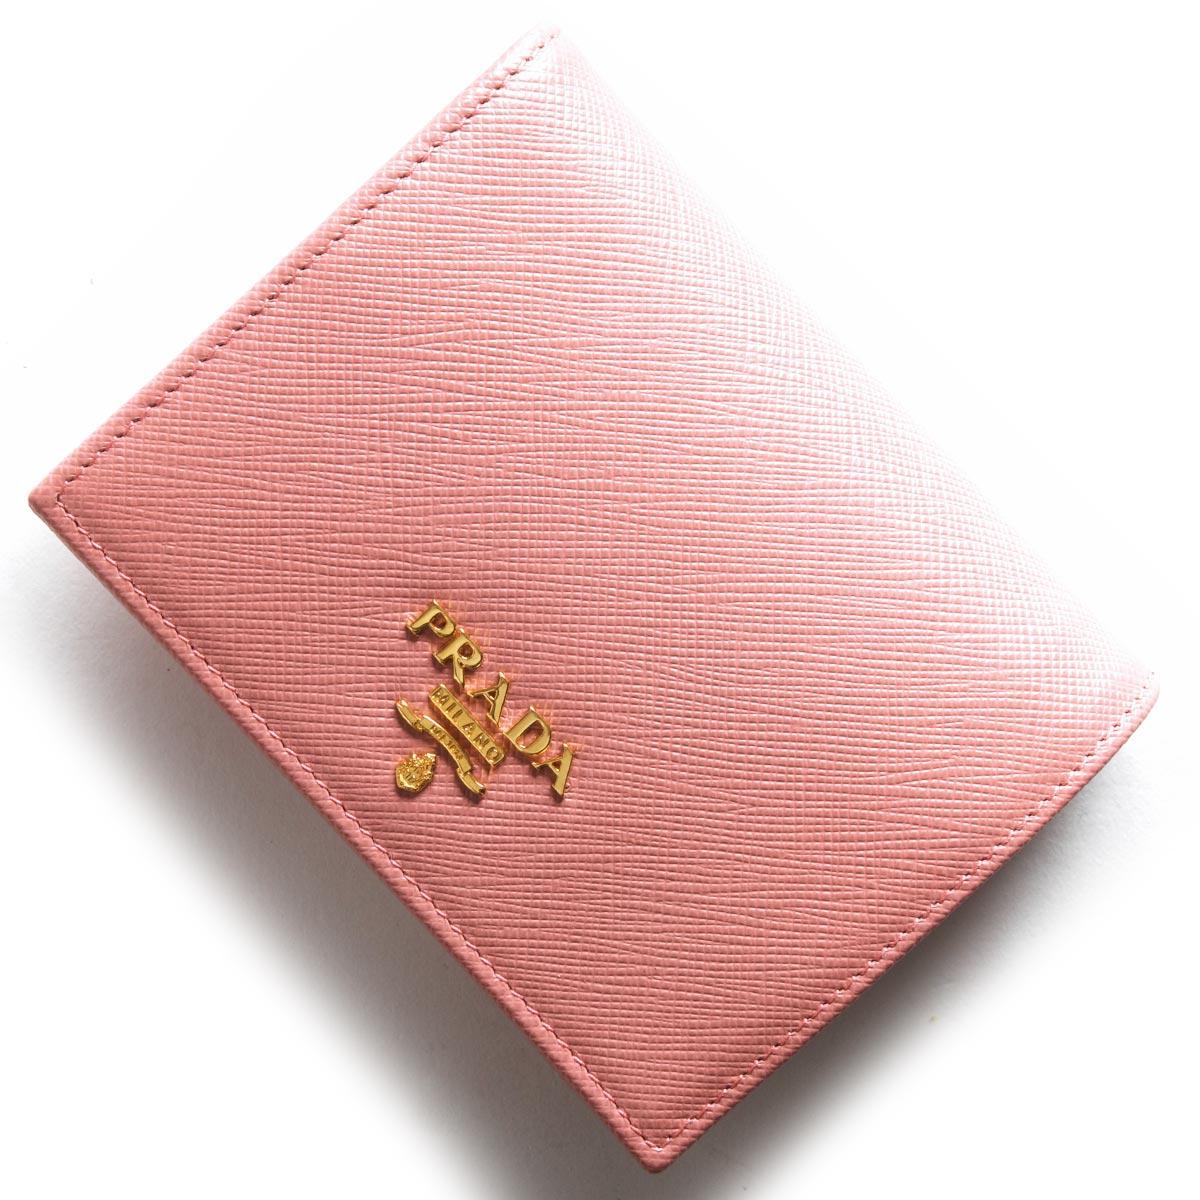 bb352e8b7d39 プラダ PRADA 二つ折り財布 サフィアーノ メタル SAFFIANO METAL ペタロピンク 1MV204 QWA F0442 レディース  【個性派】